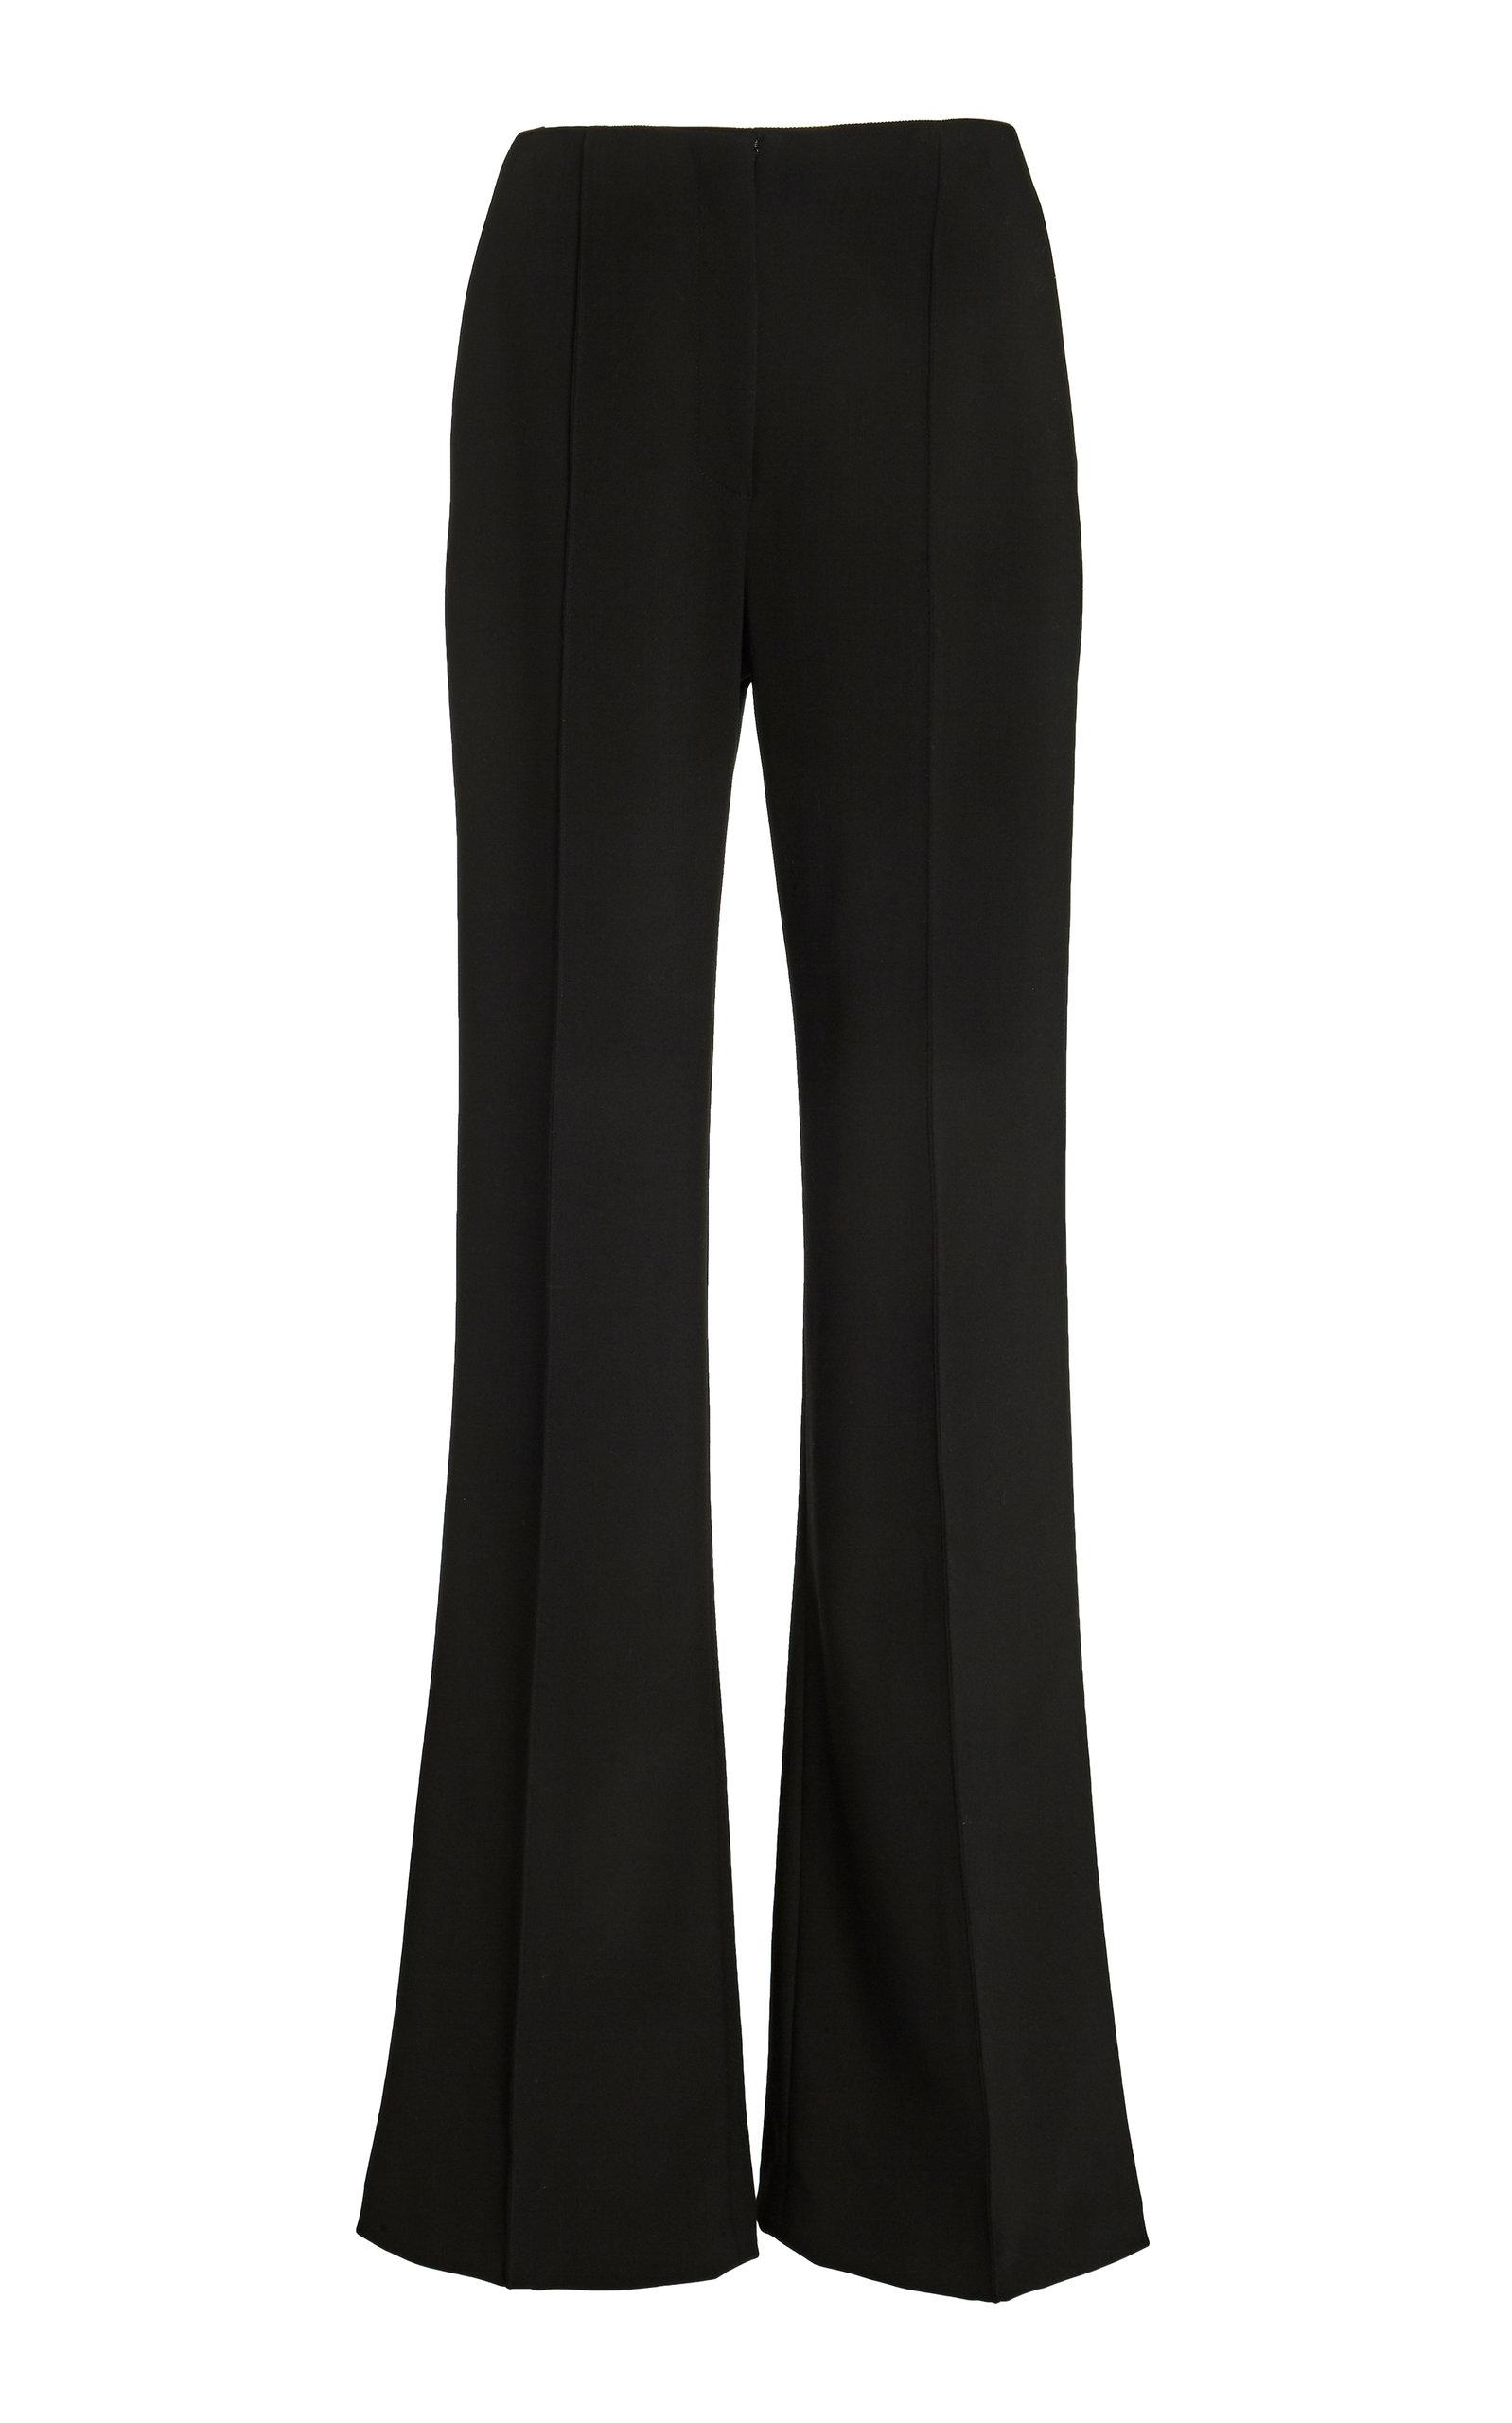 Carolina Herrera Silks HIGH-WAISTED SILK-CREPE FLARED PANTS SIZE: 8